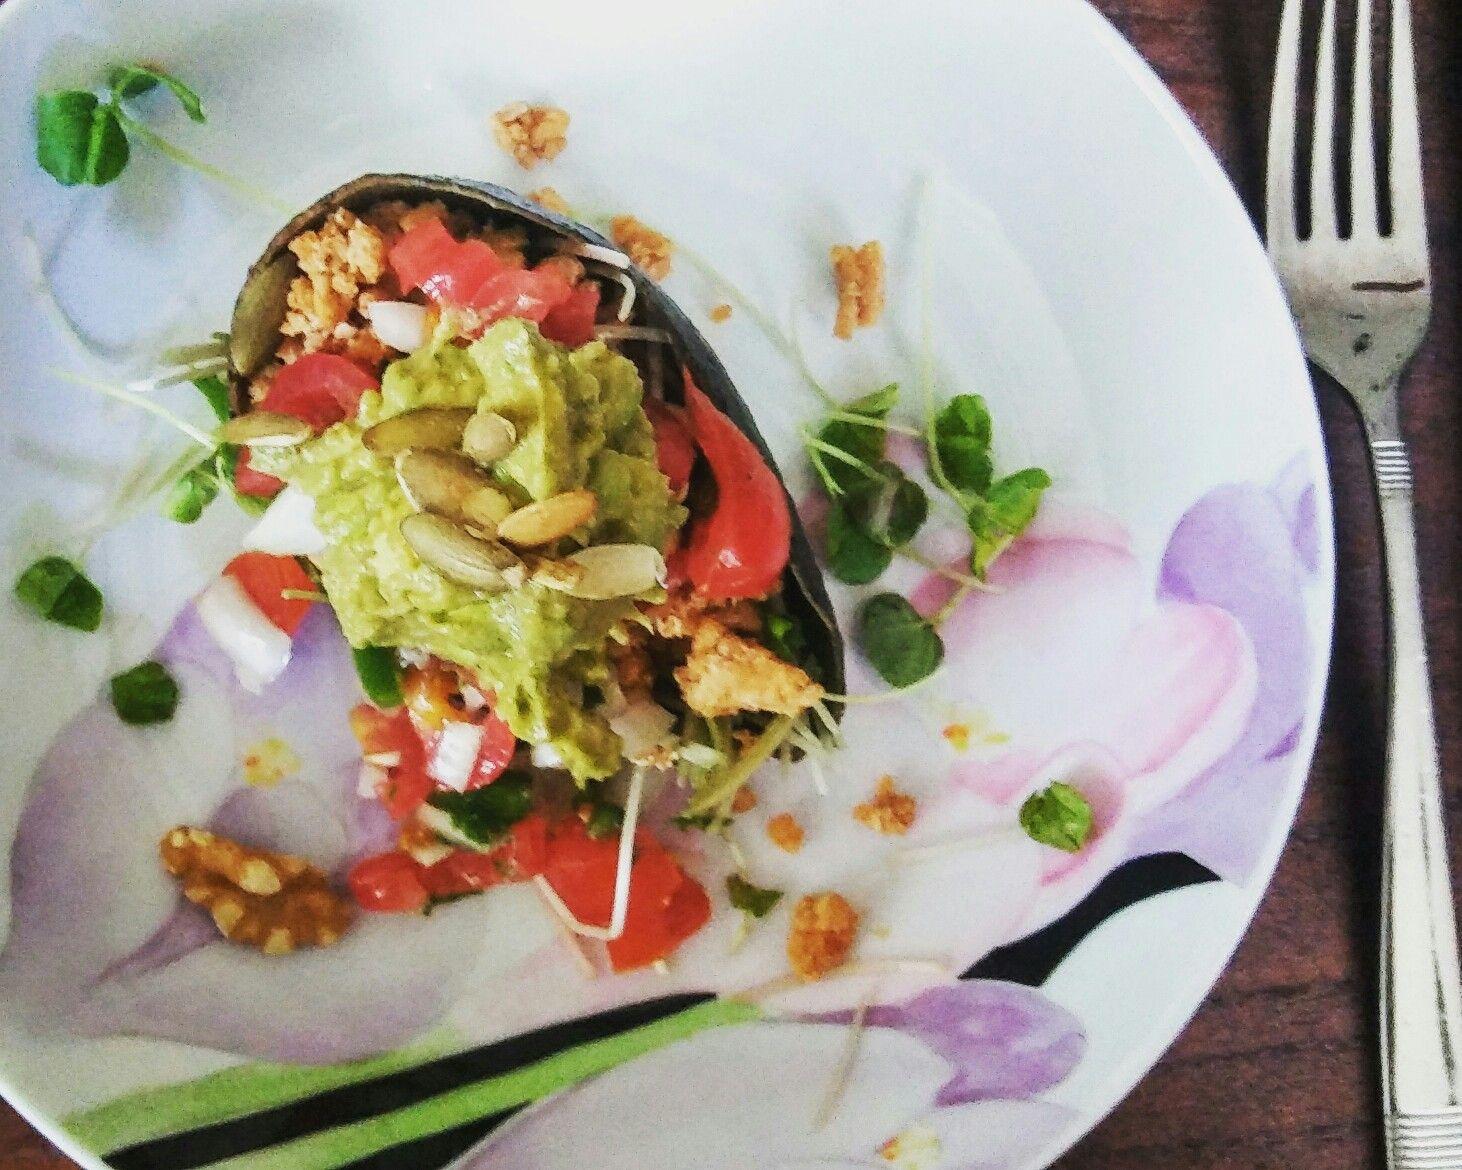 Taco salad in an avocado cup